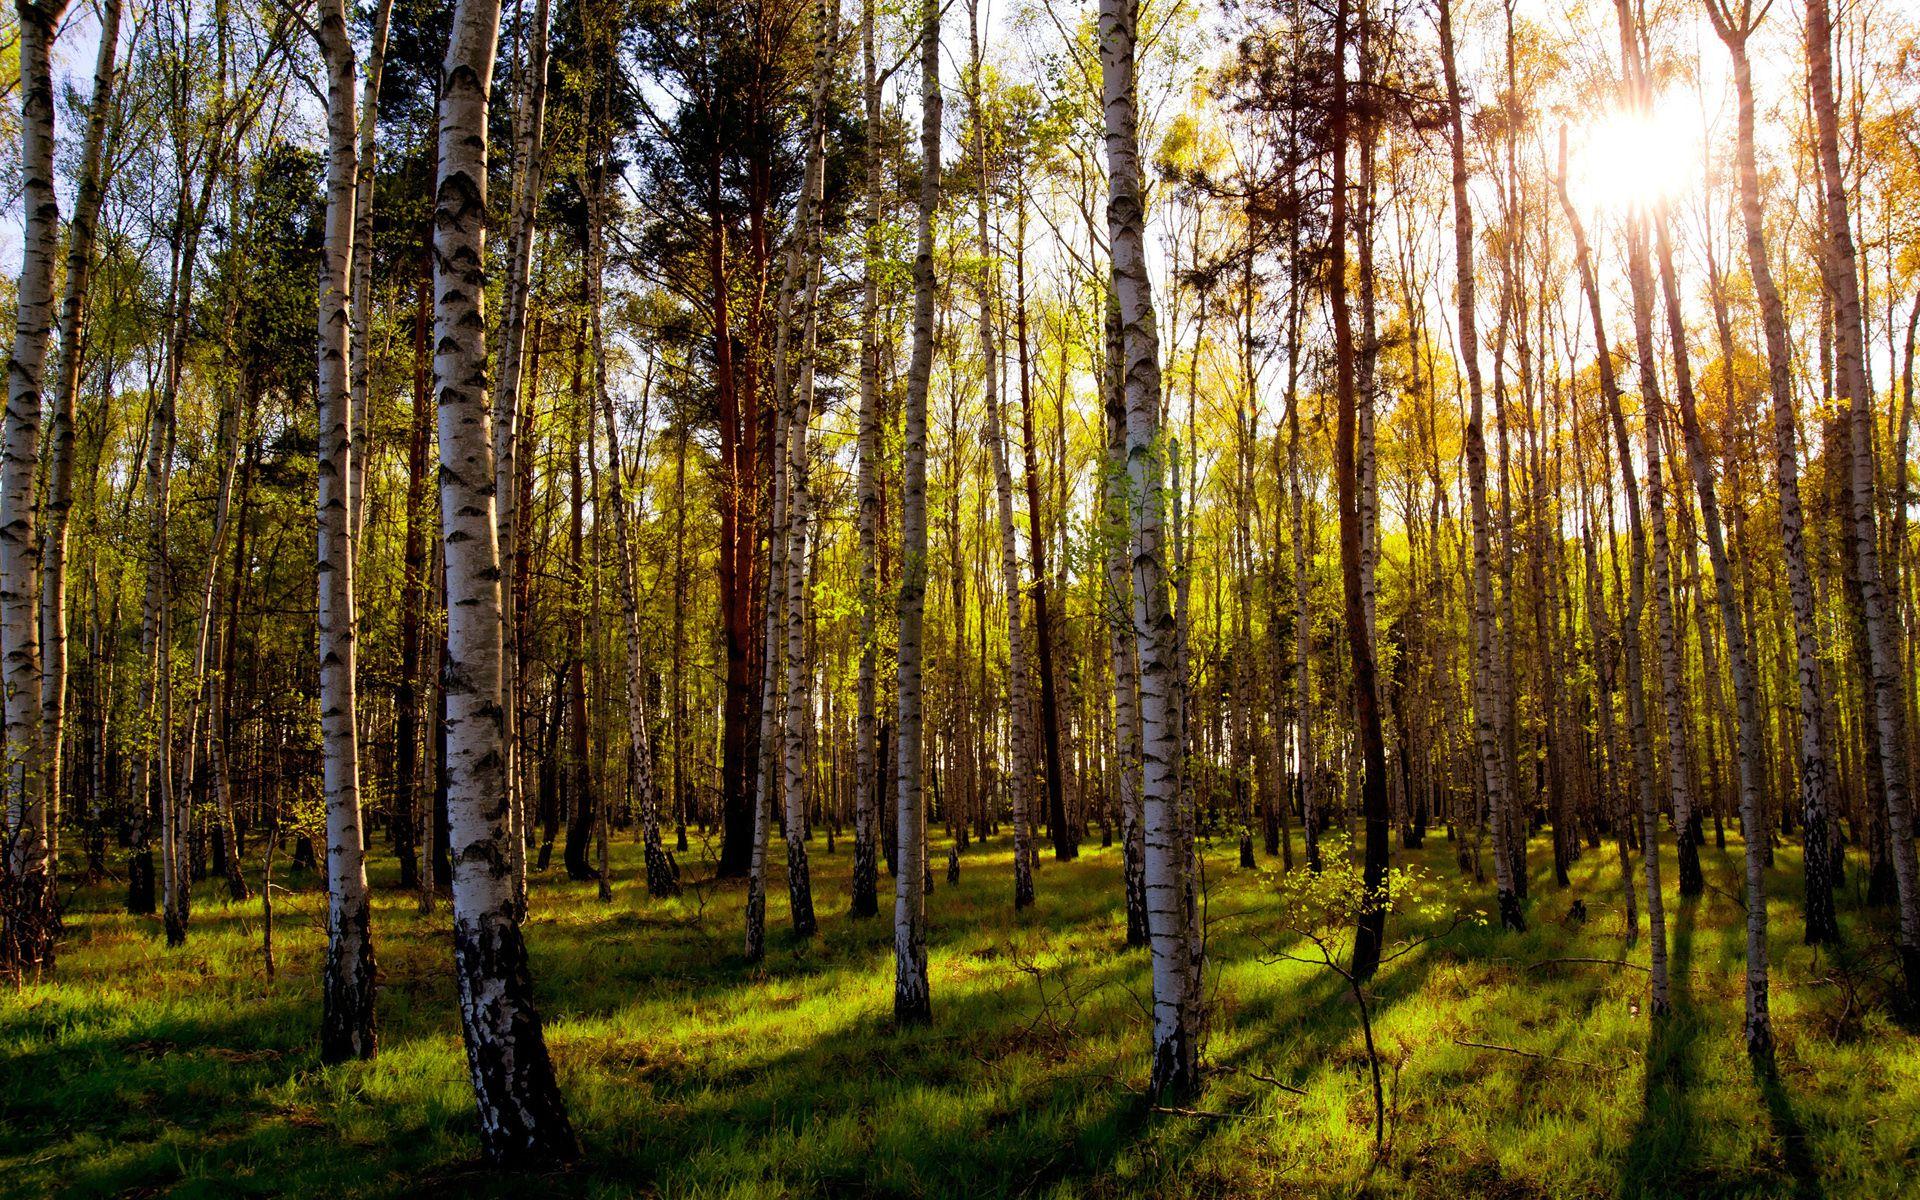 Березовый лес картинки